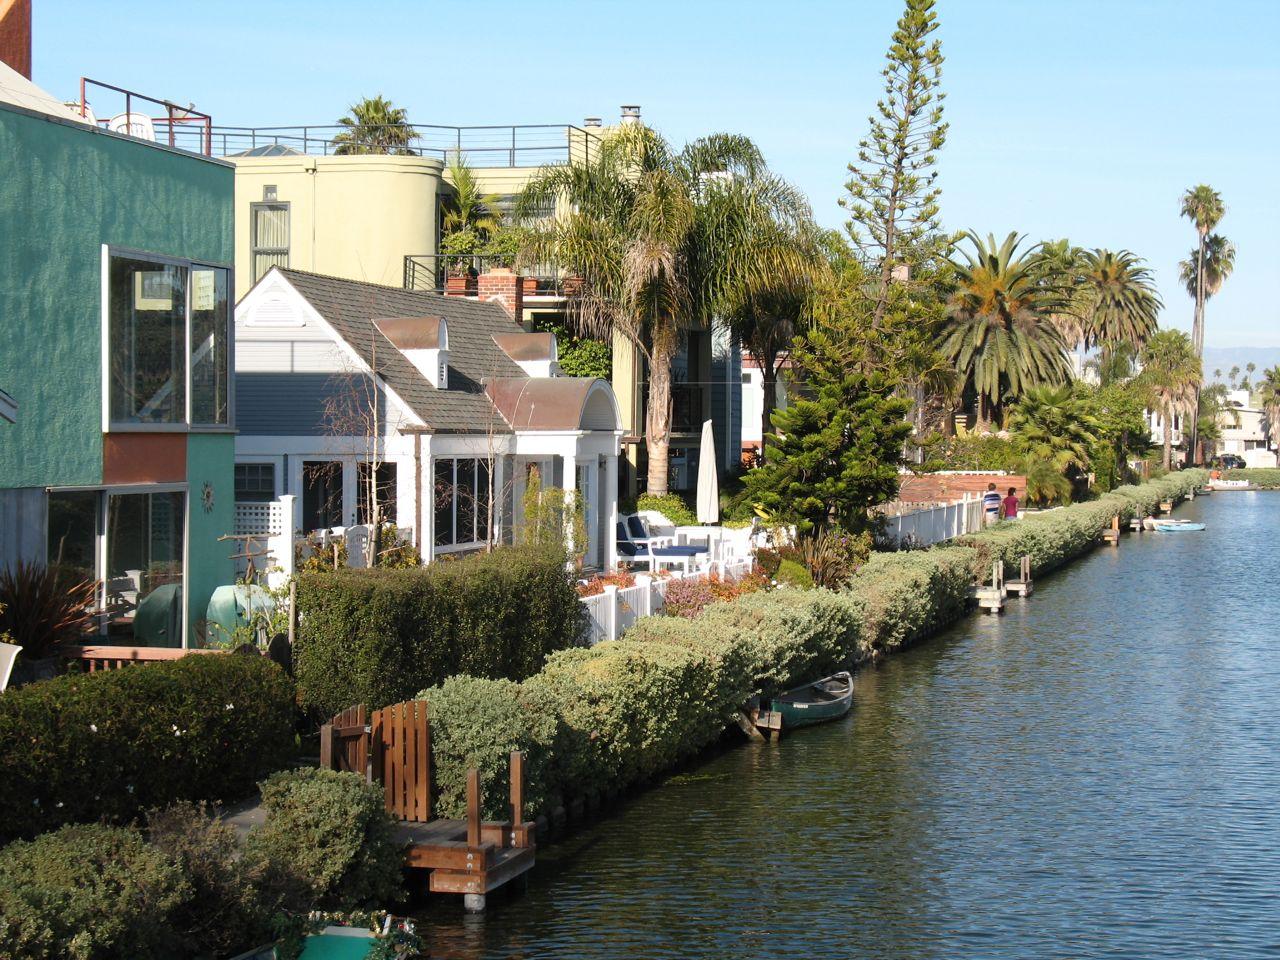 https://i1.wp.com/www.alicesgardentravelbuzz.com/wp-content/uploads/2011/03/Venice-California-Canal-Photo-Alice-Joyce1.jpg